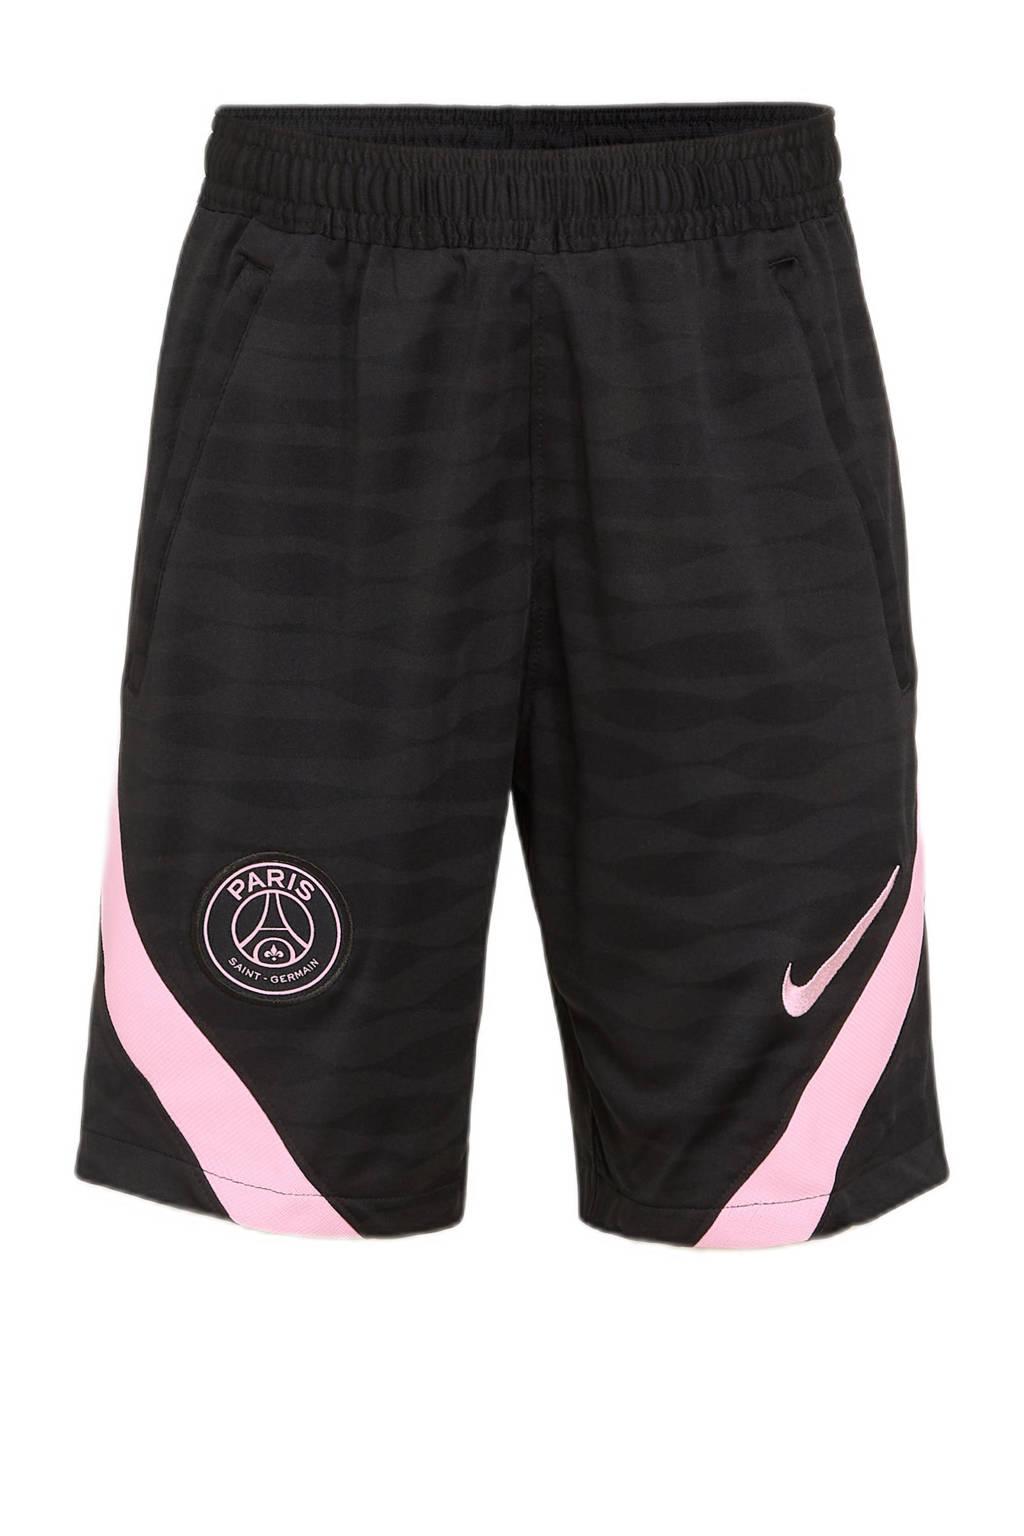 Nike Junior Paris Saint Germain Paris Saint Germain voetbalshort uit, Zwart